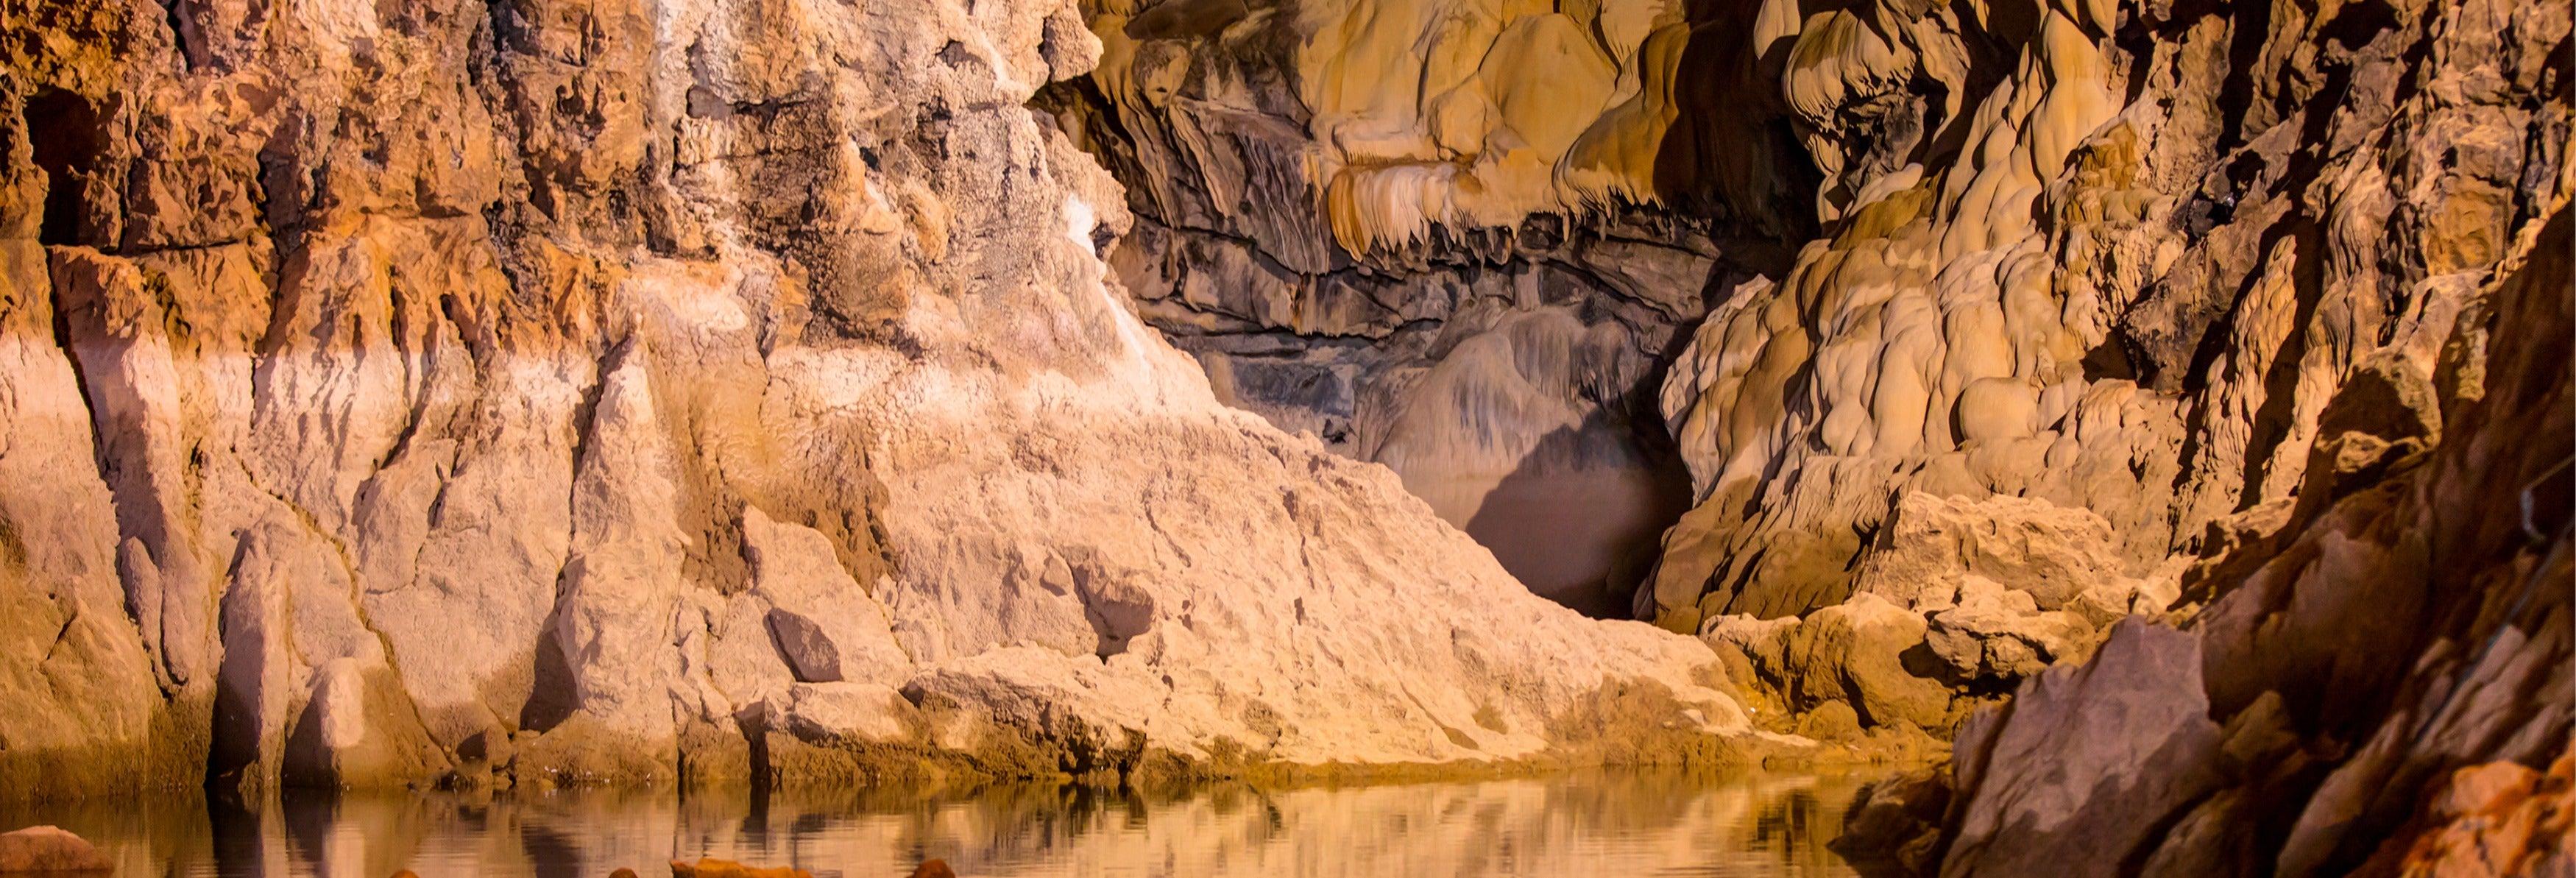 Excursión a la cueva Altinbesik, Avasun y Ürünlü